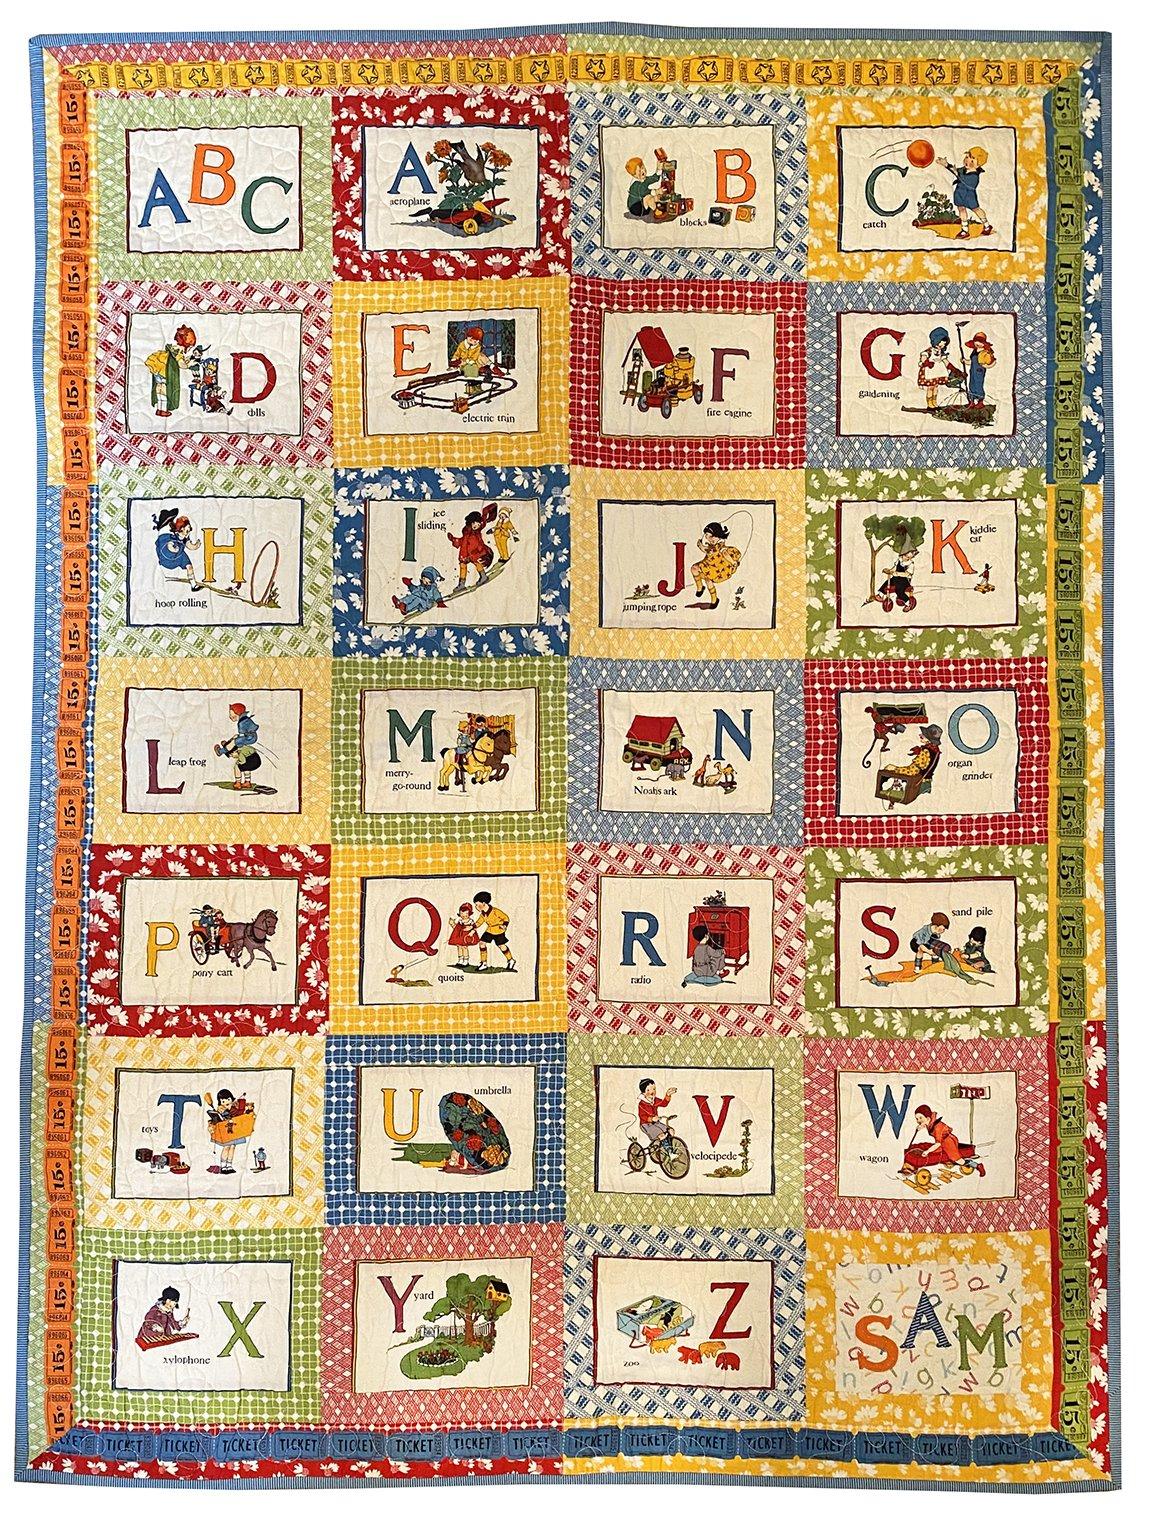 It's Elementary ABC Panel Quilt